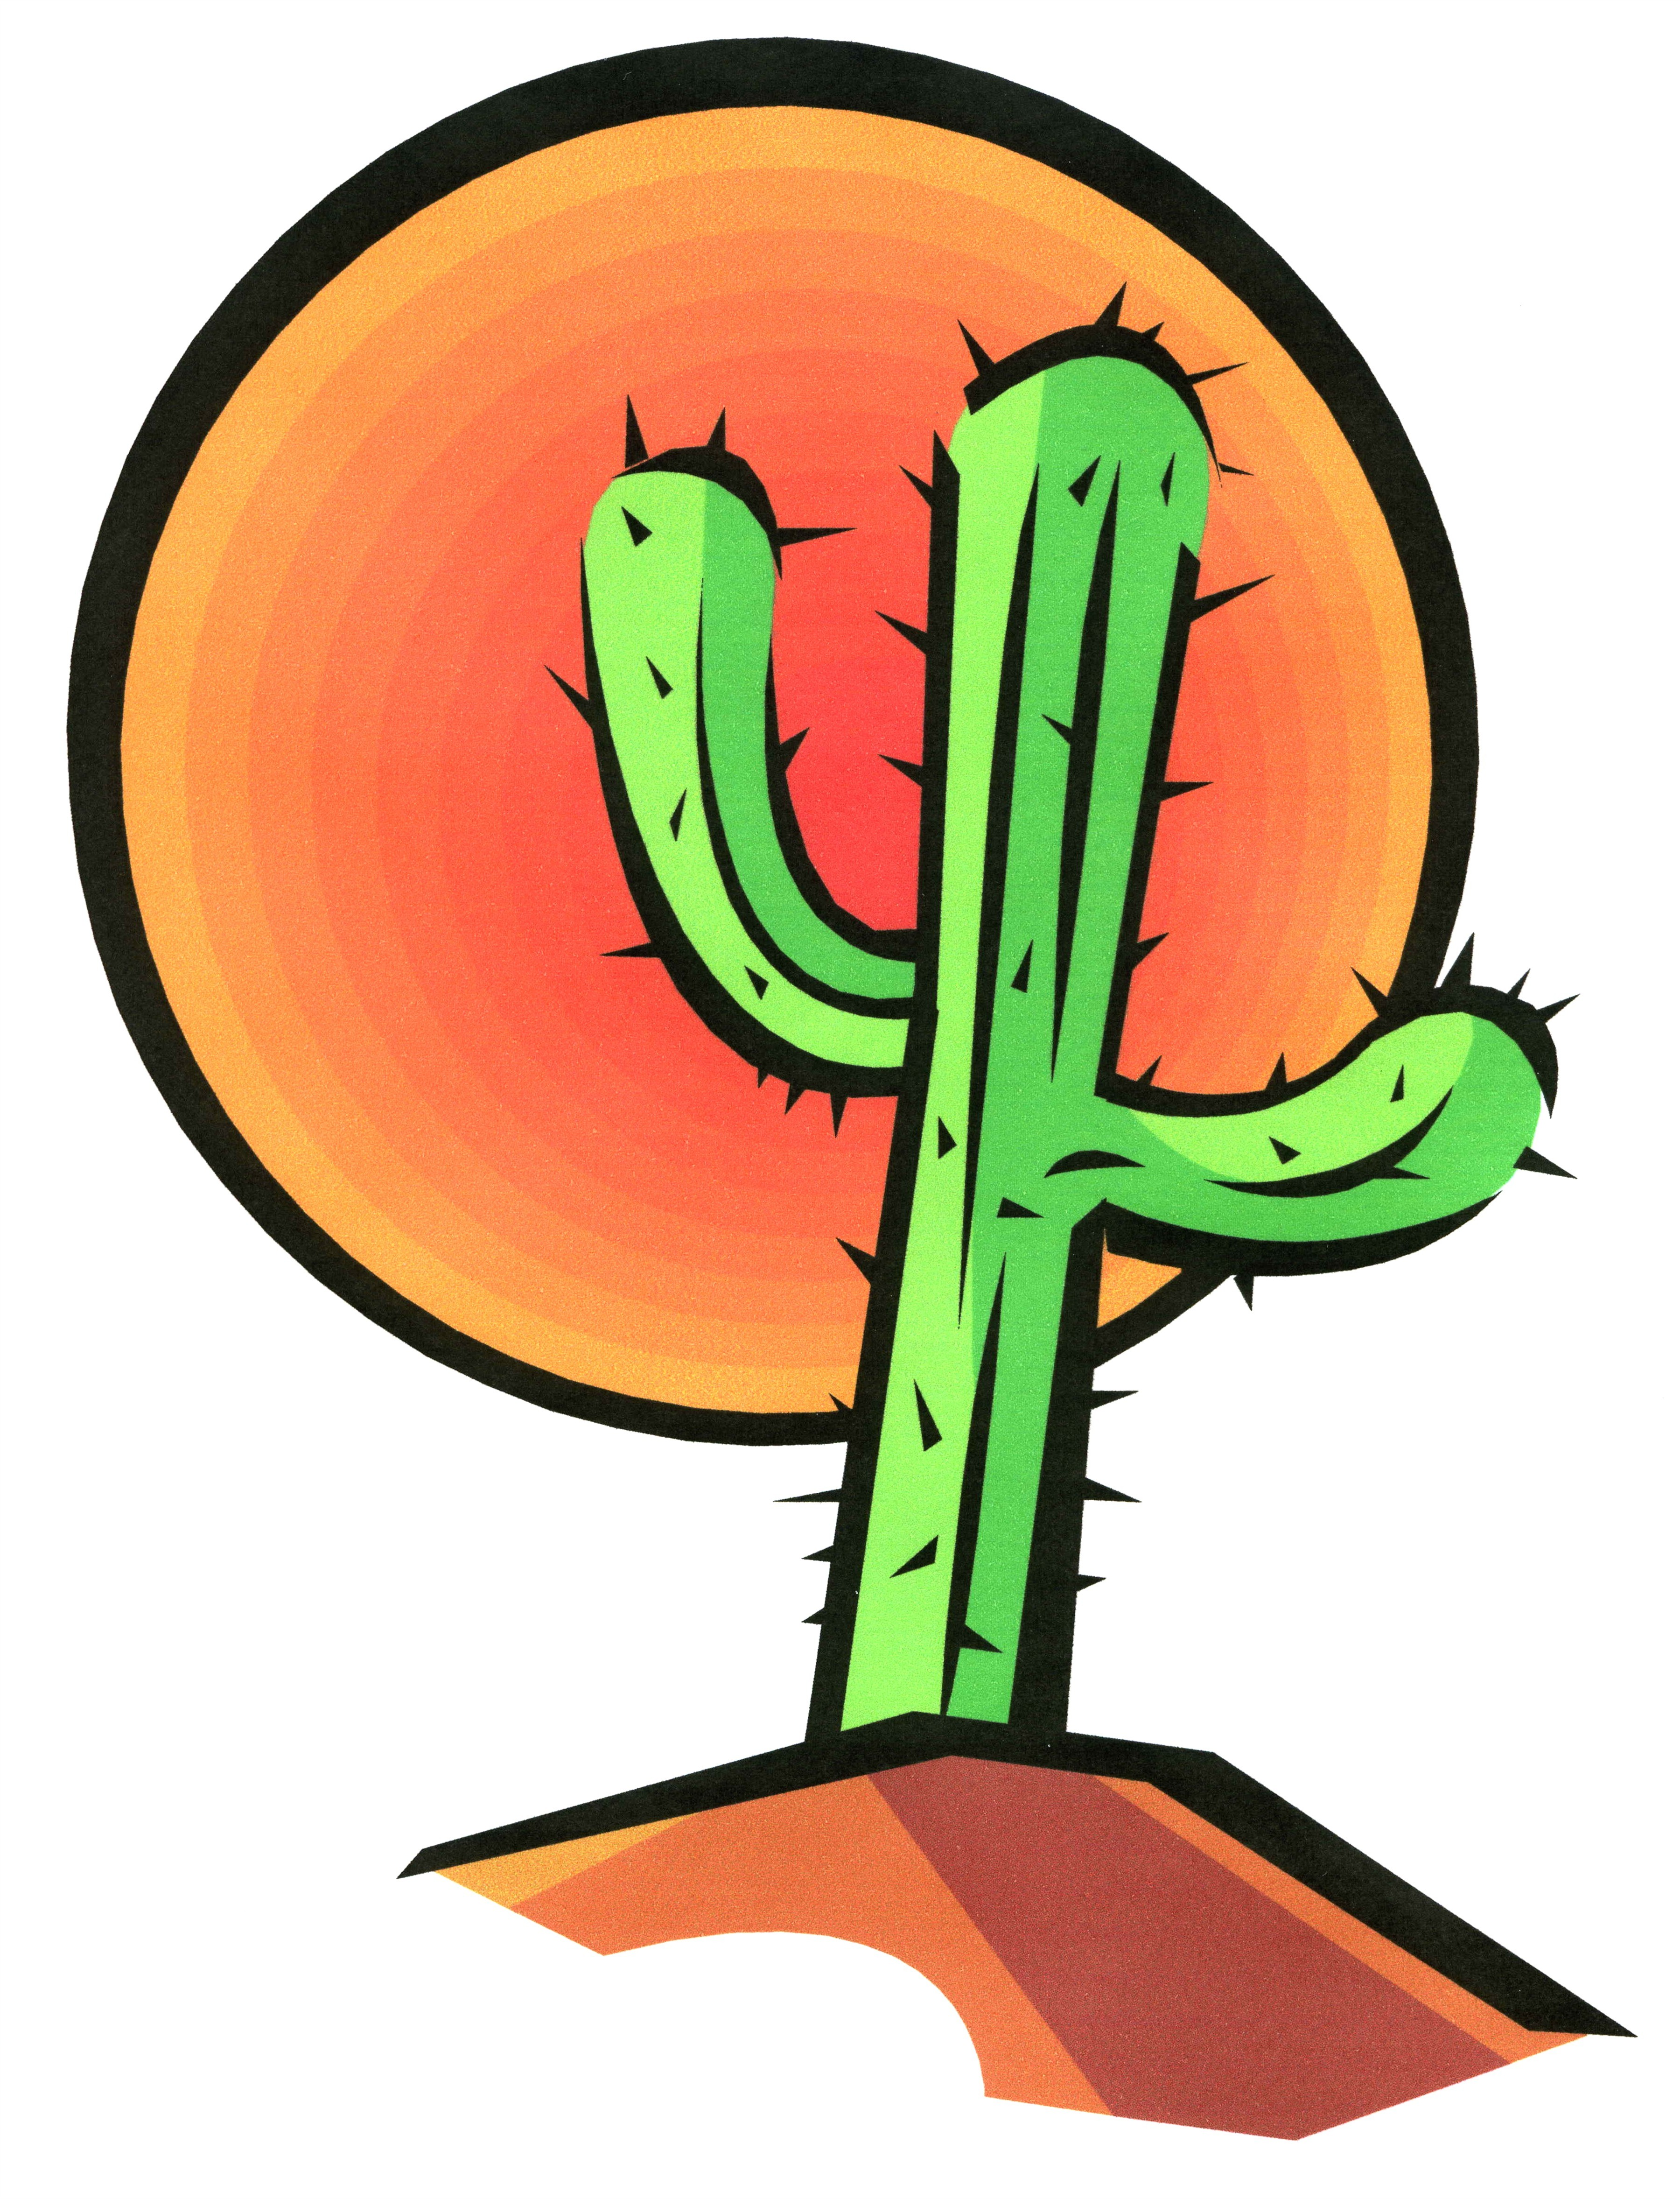 Desert clipart desert sun. Free download best